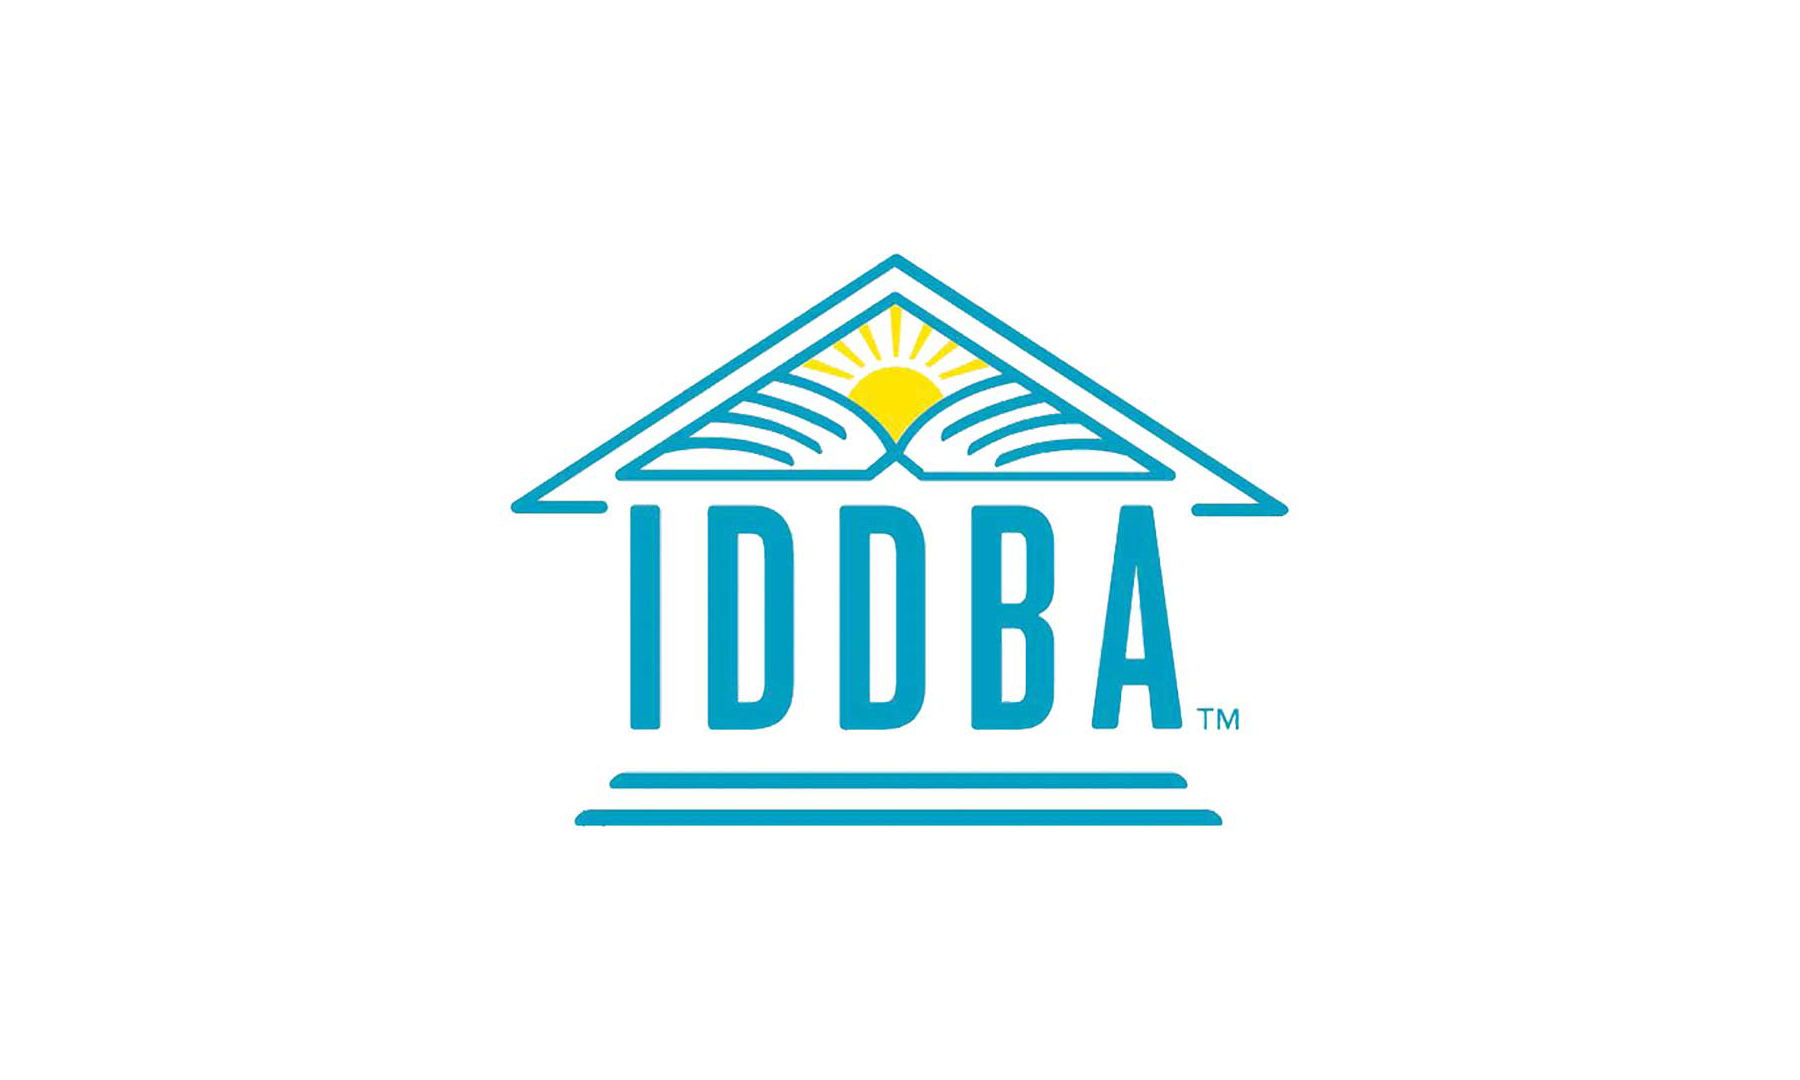 IDDBA logo store